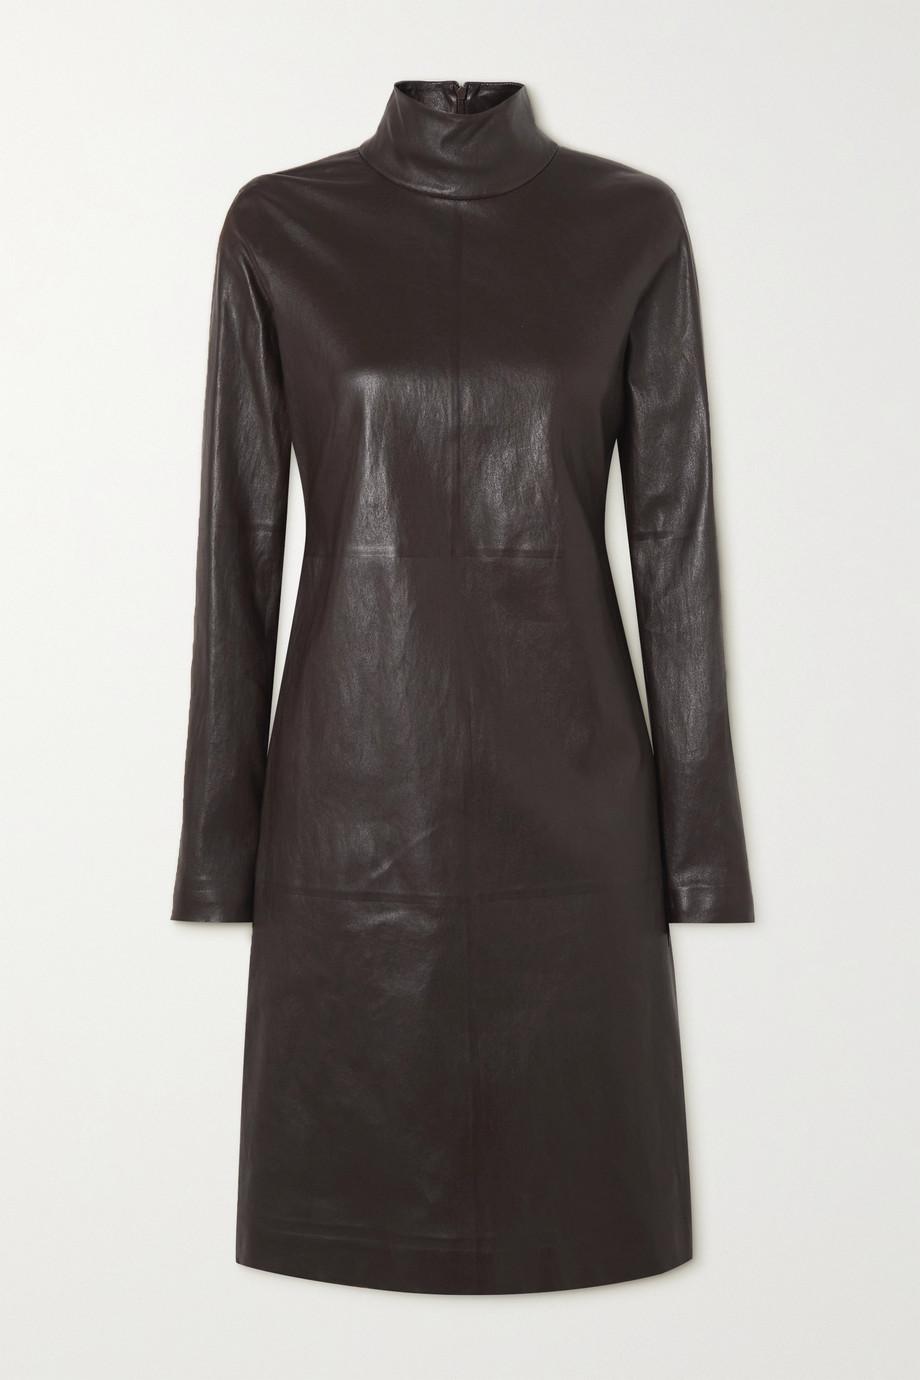 Bottega Veneta Leather turtleneck dress